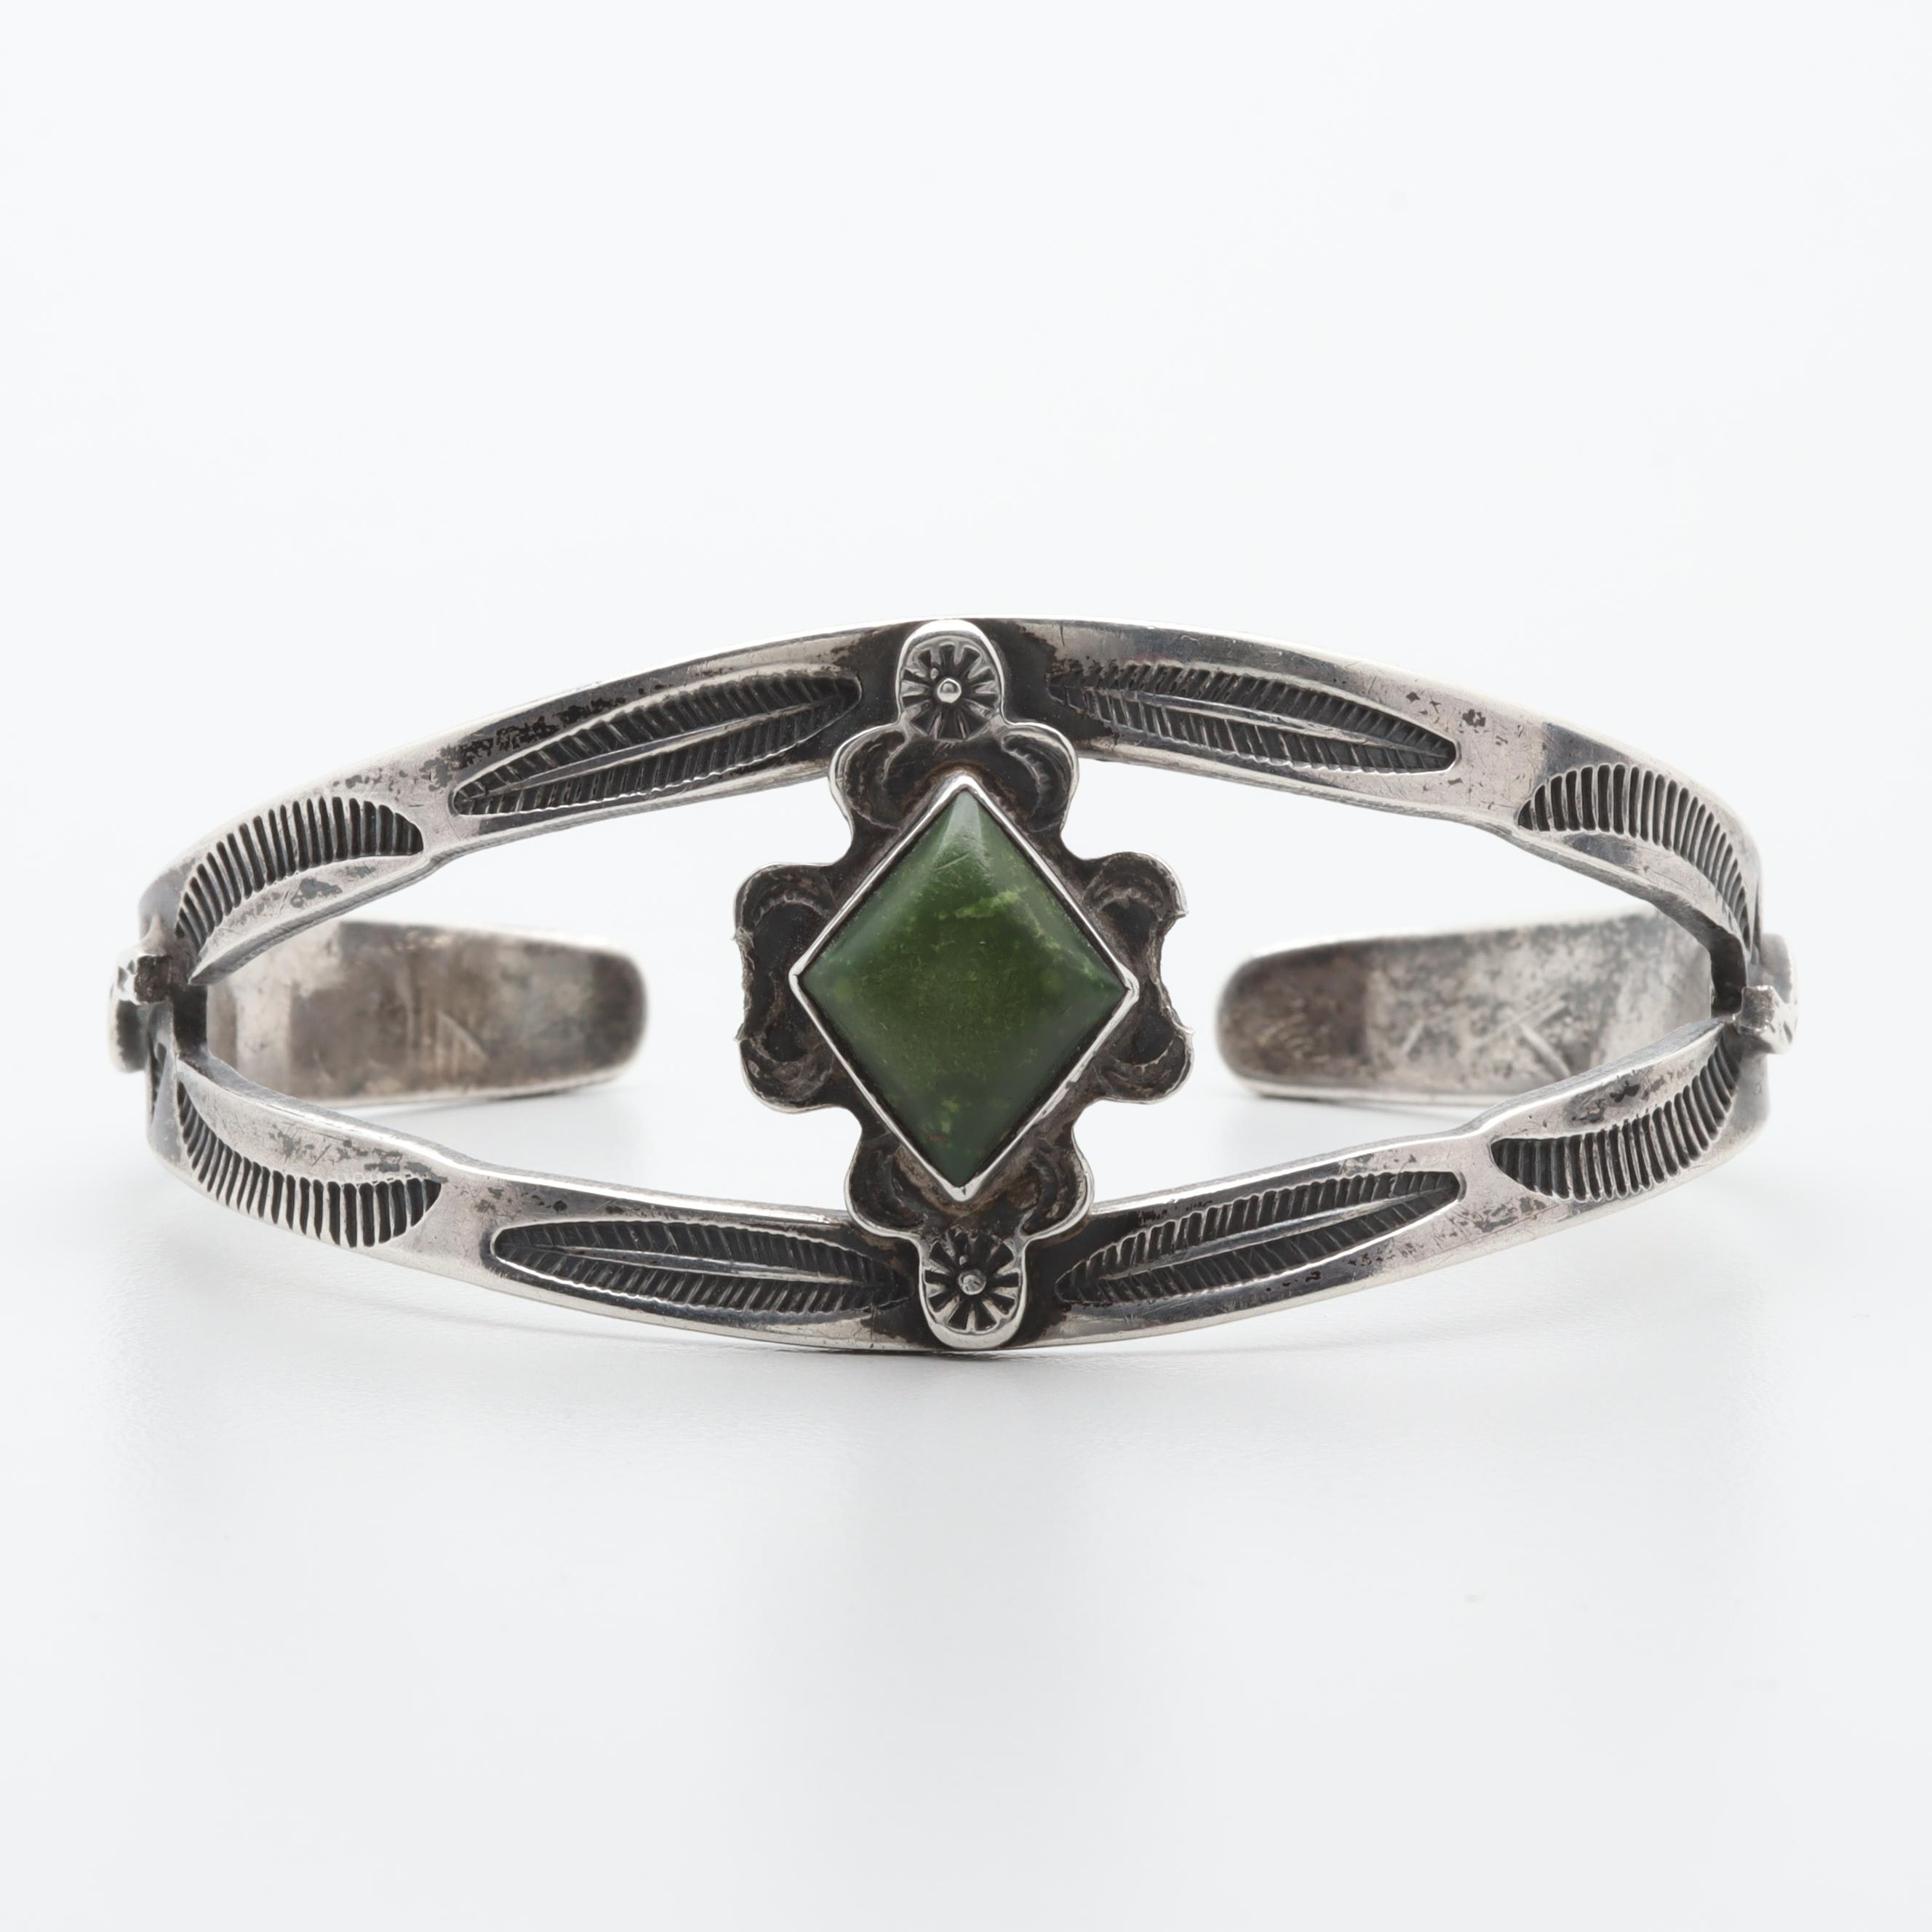 Southwestern Style Sterling Silver Green Turquoise Cuff Bracelet